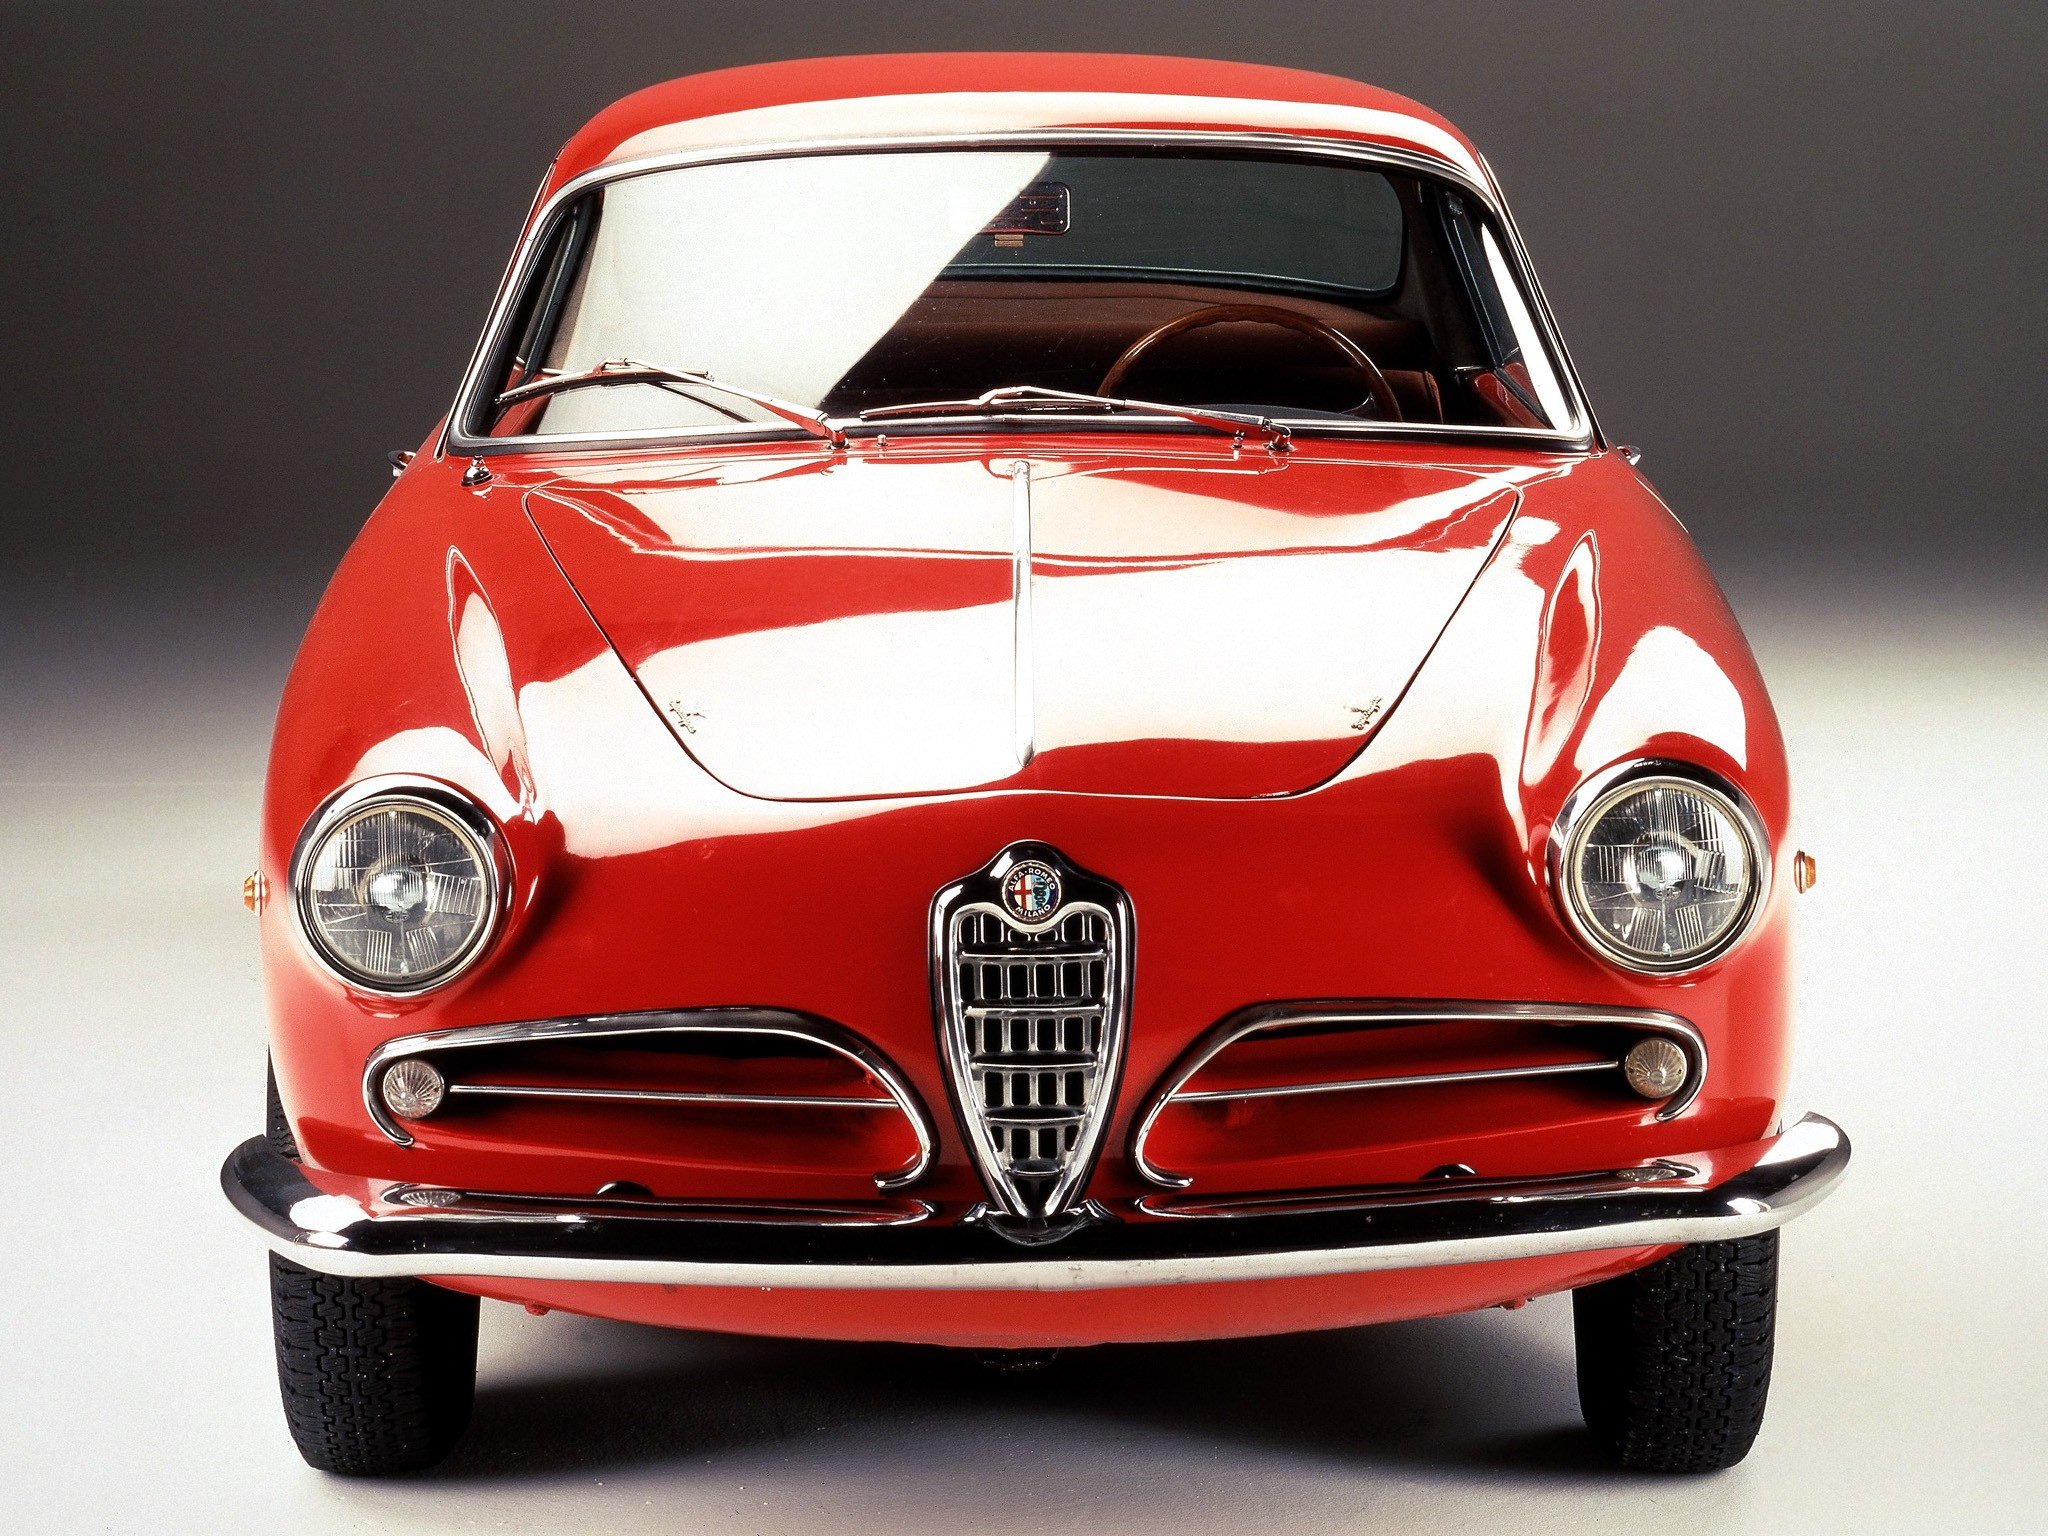 alfa romeo 1900 super sprint specs 1956 1957 1958 1959 autoevolution. Black Bedroom Furniture Sets. Home Design Ideas